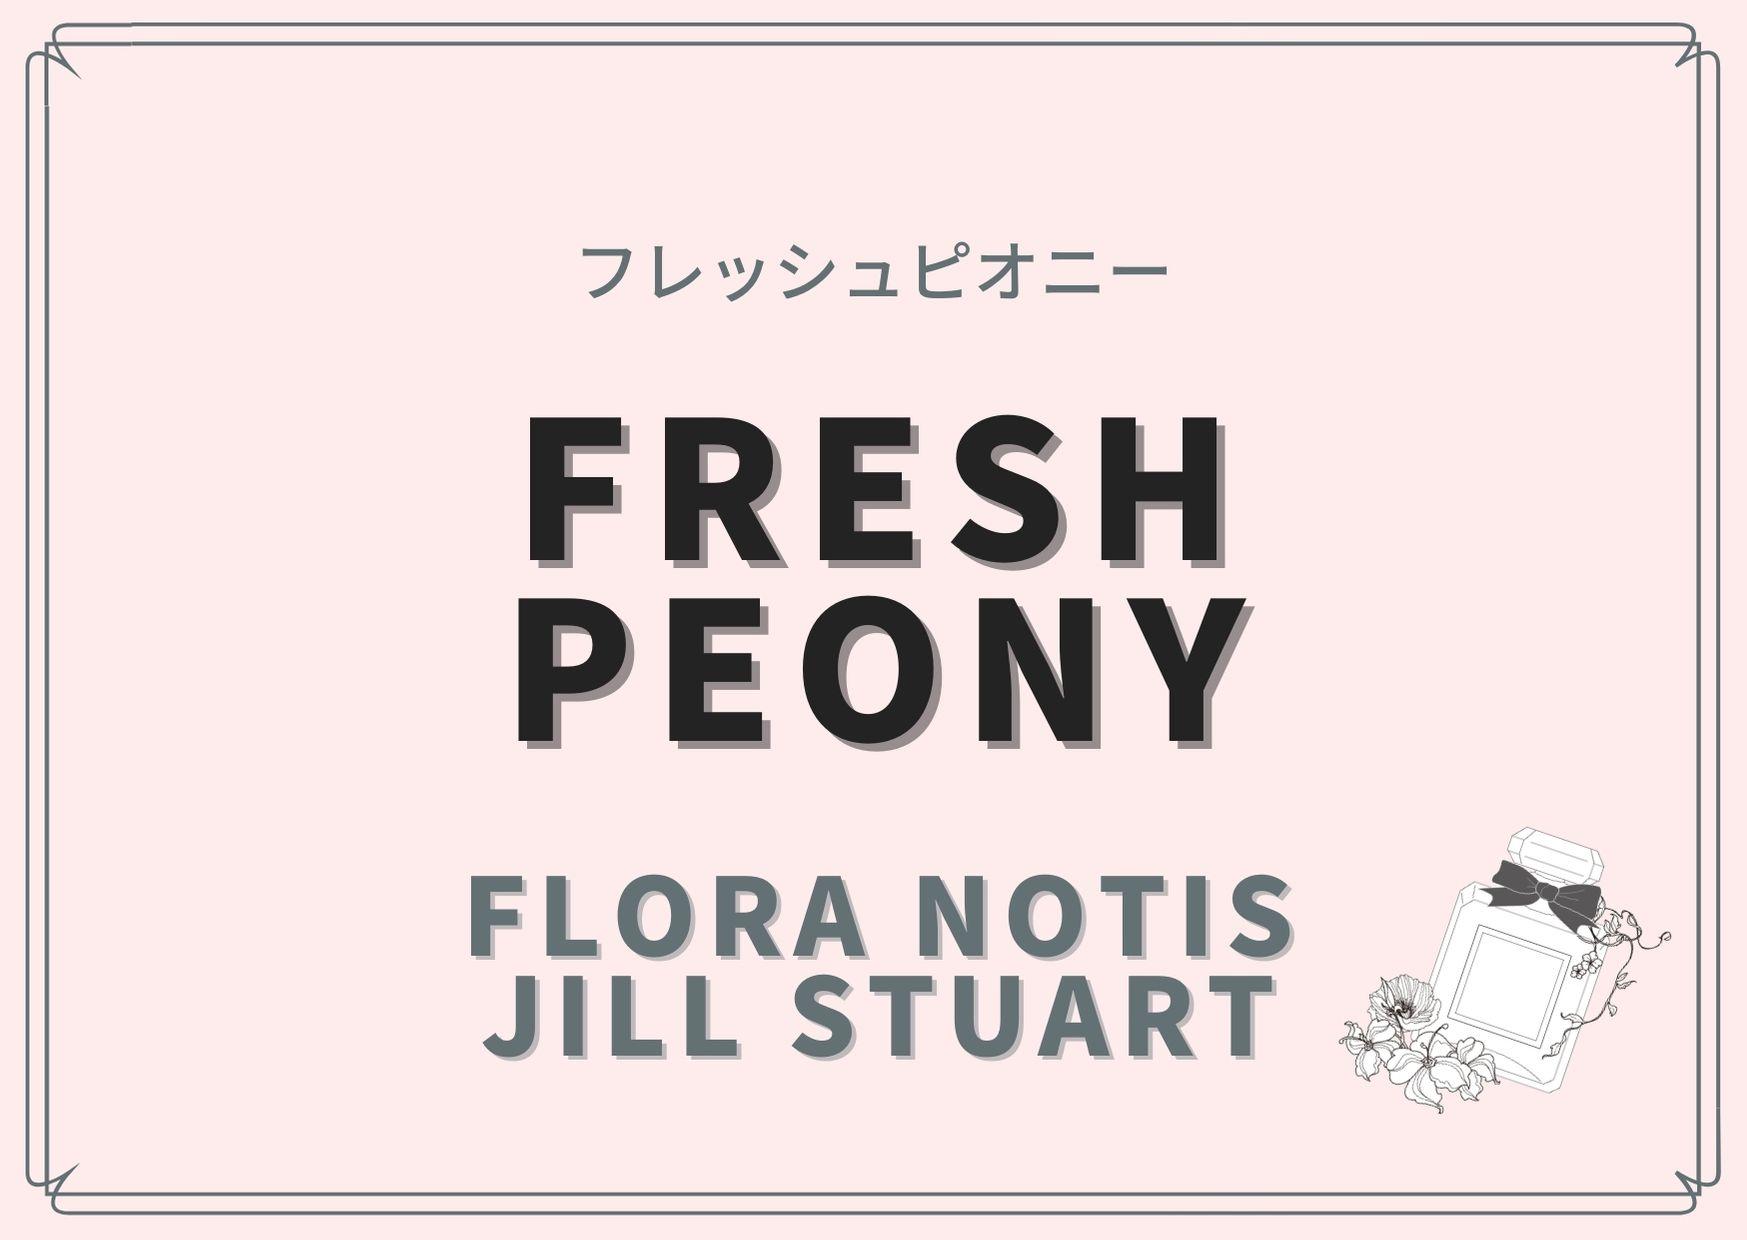 Fresh Peony(フレッシュピオニー)/Flora Notis JILL STUART